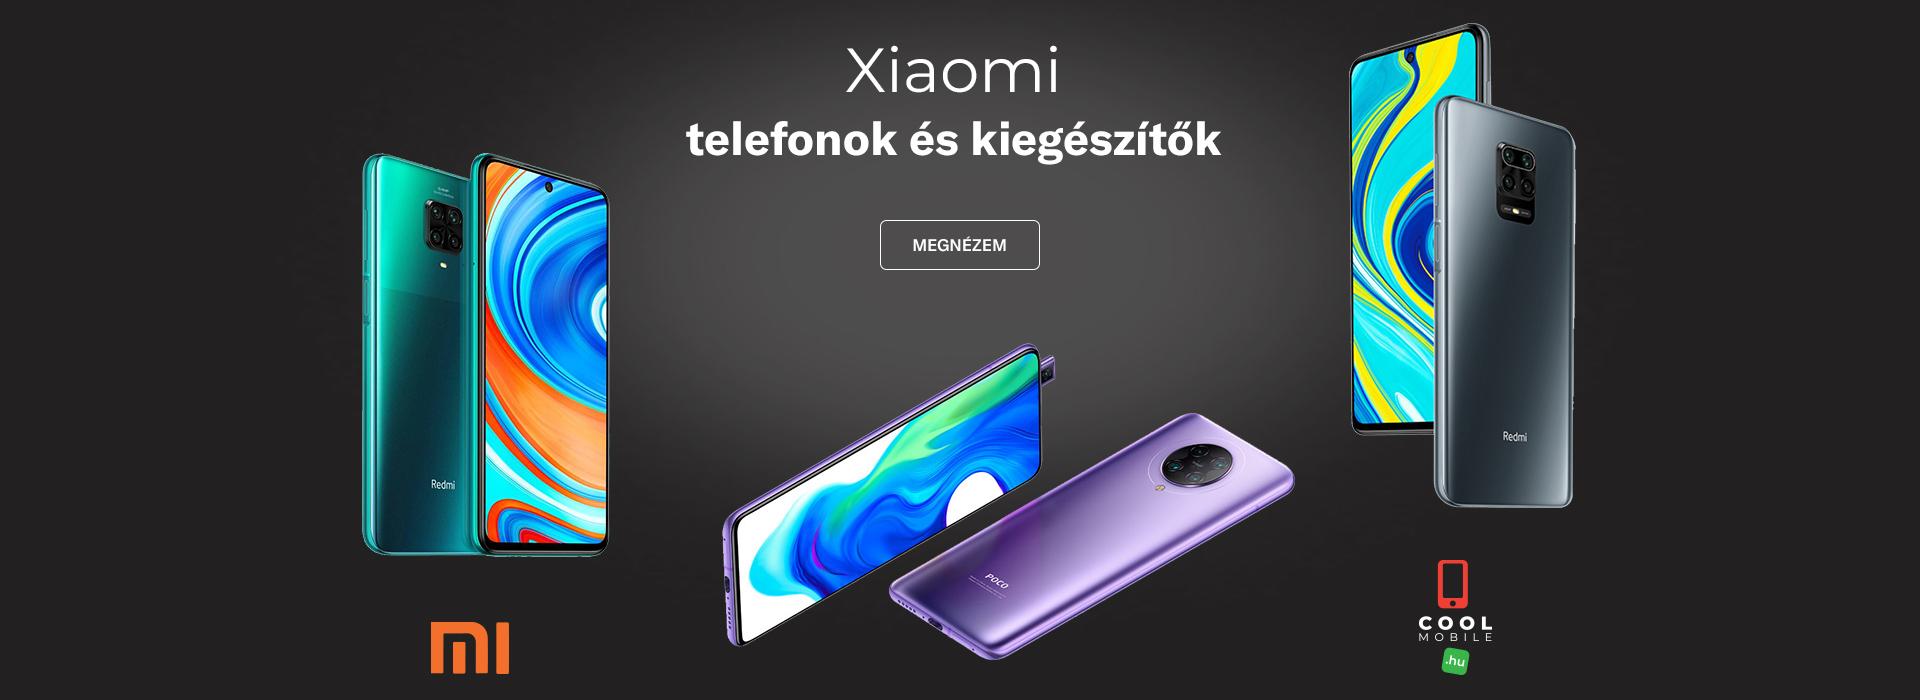 Xiaomi Okostelefonok